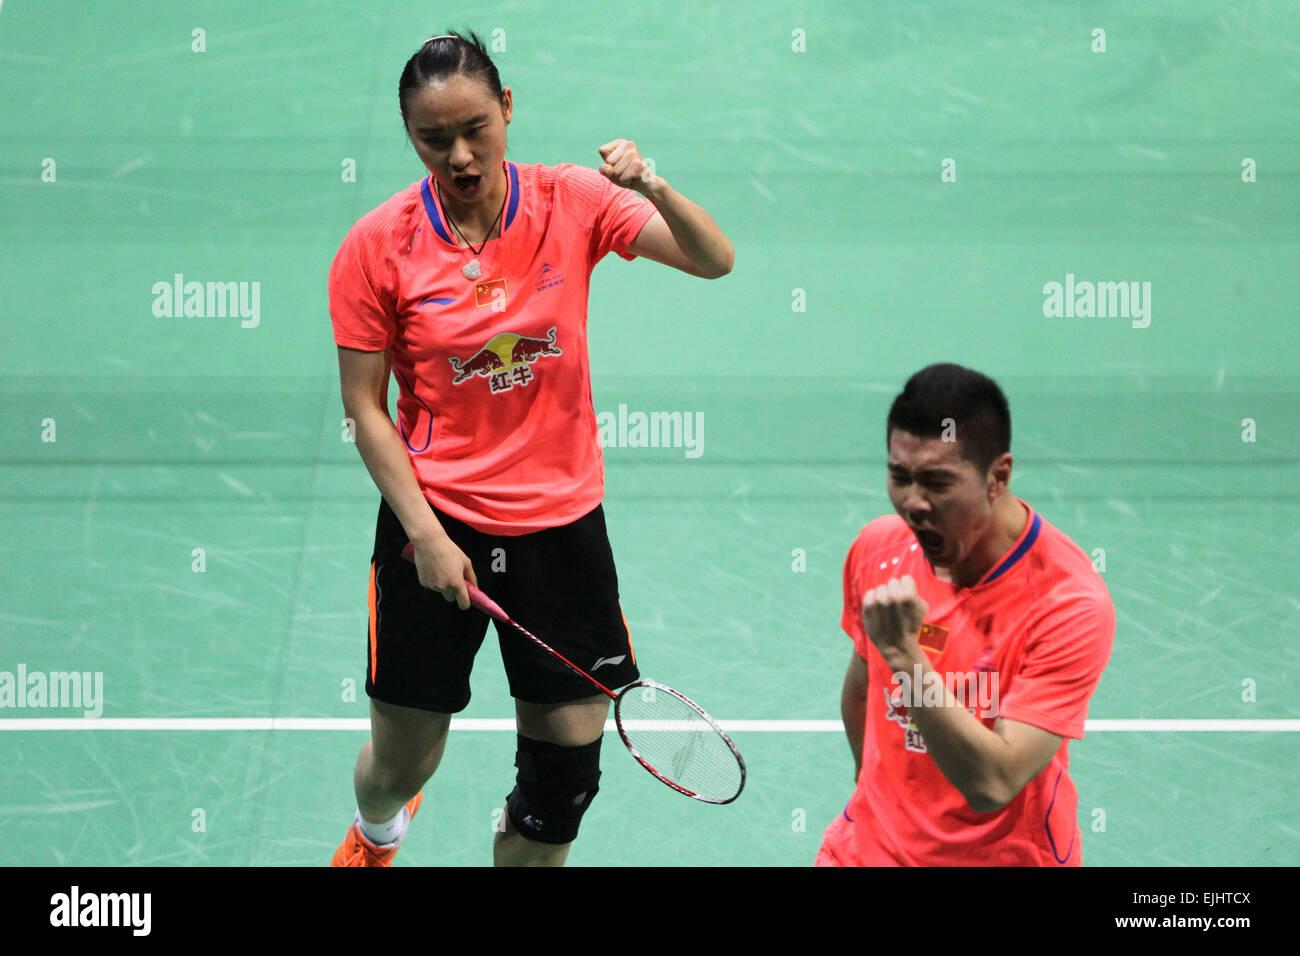 Badminton India Open 2013